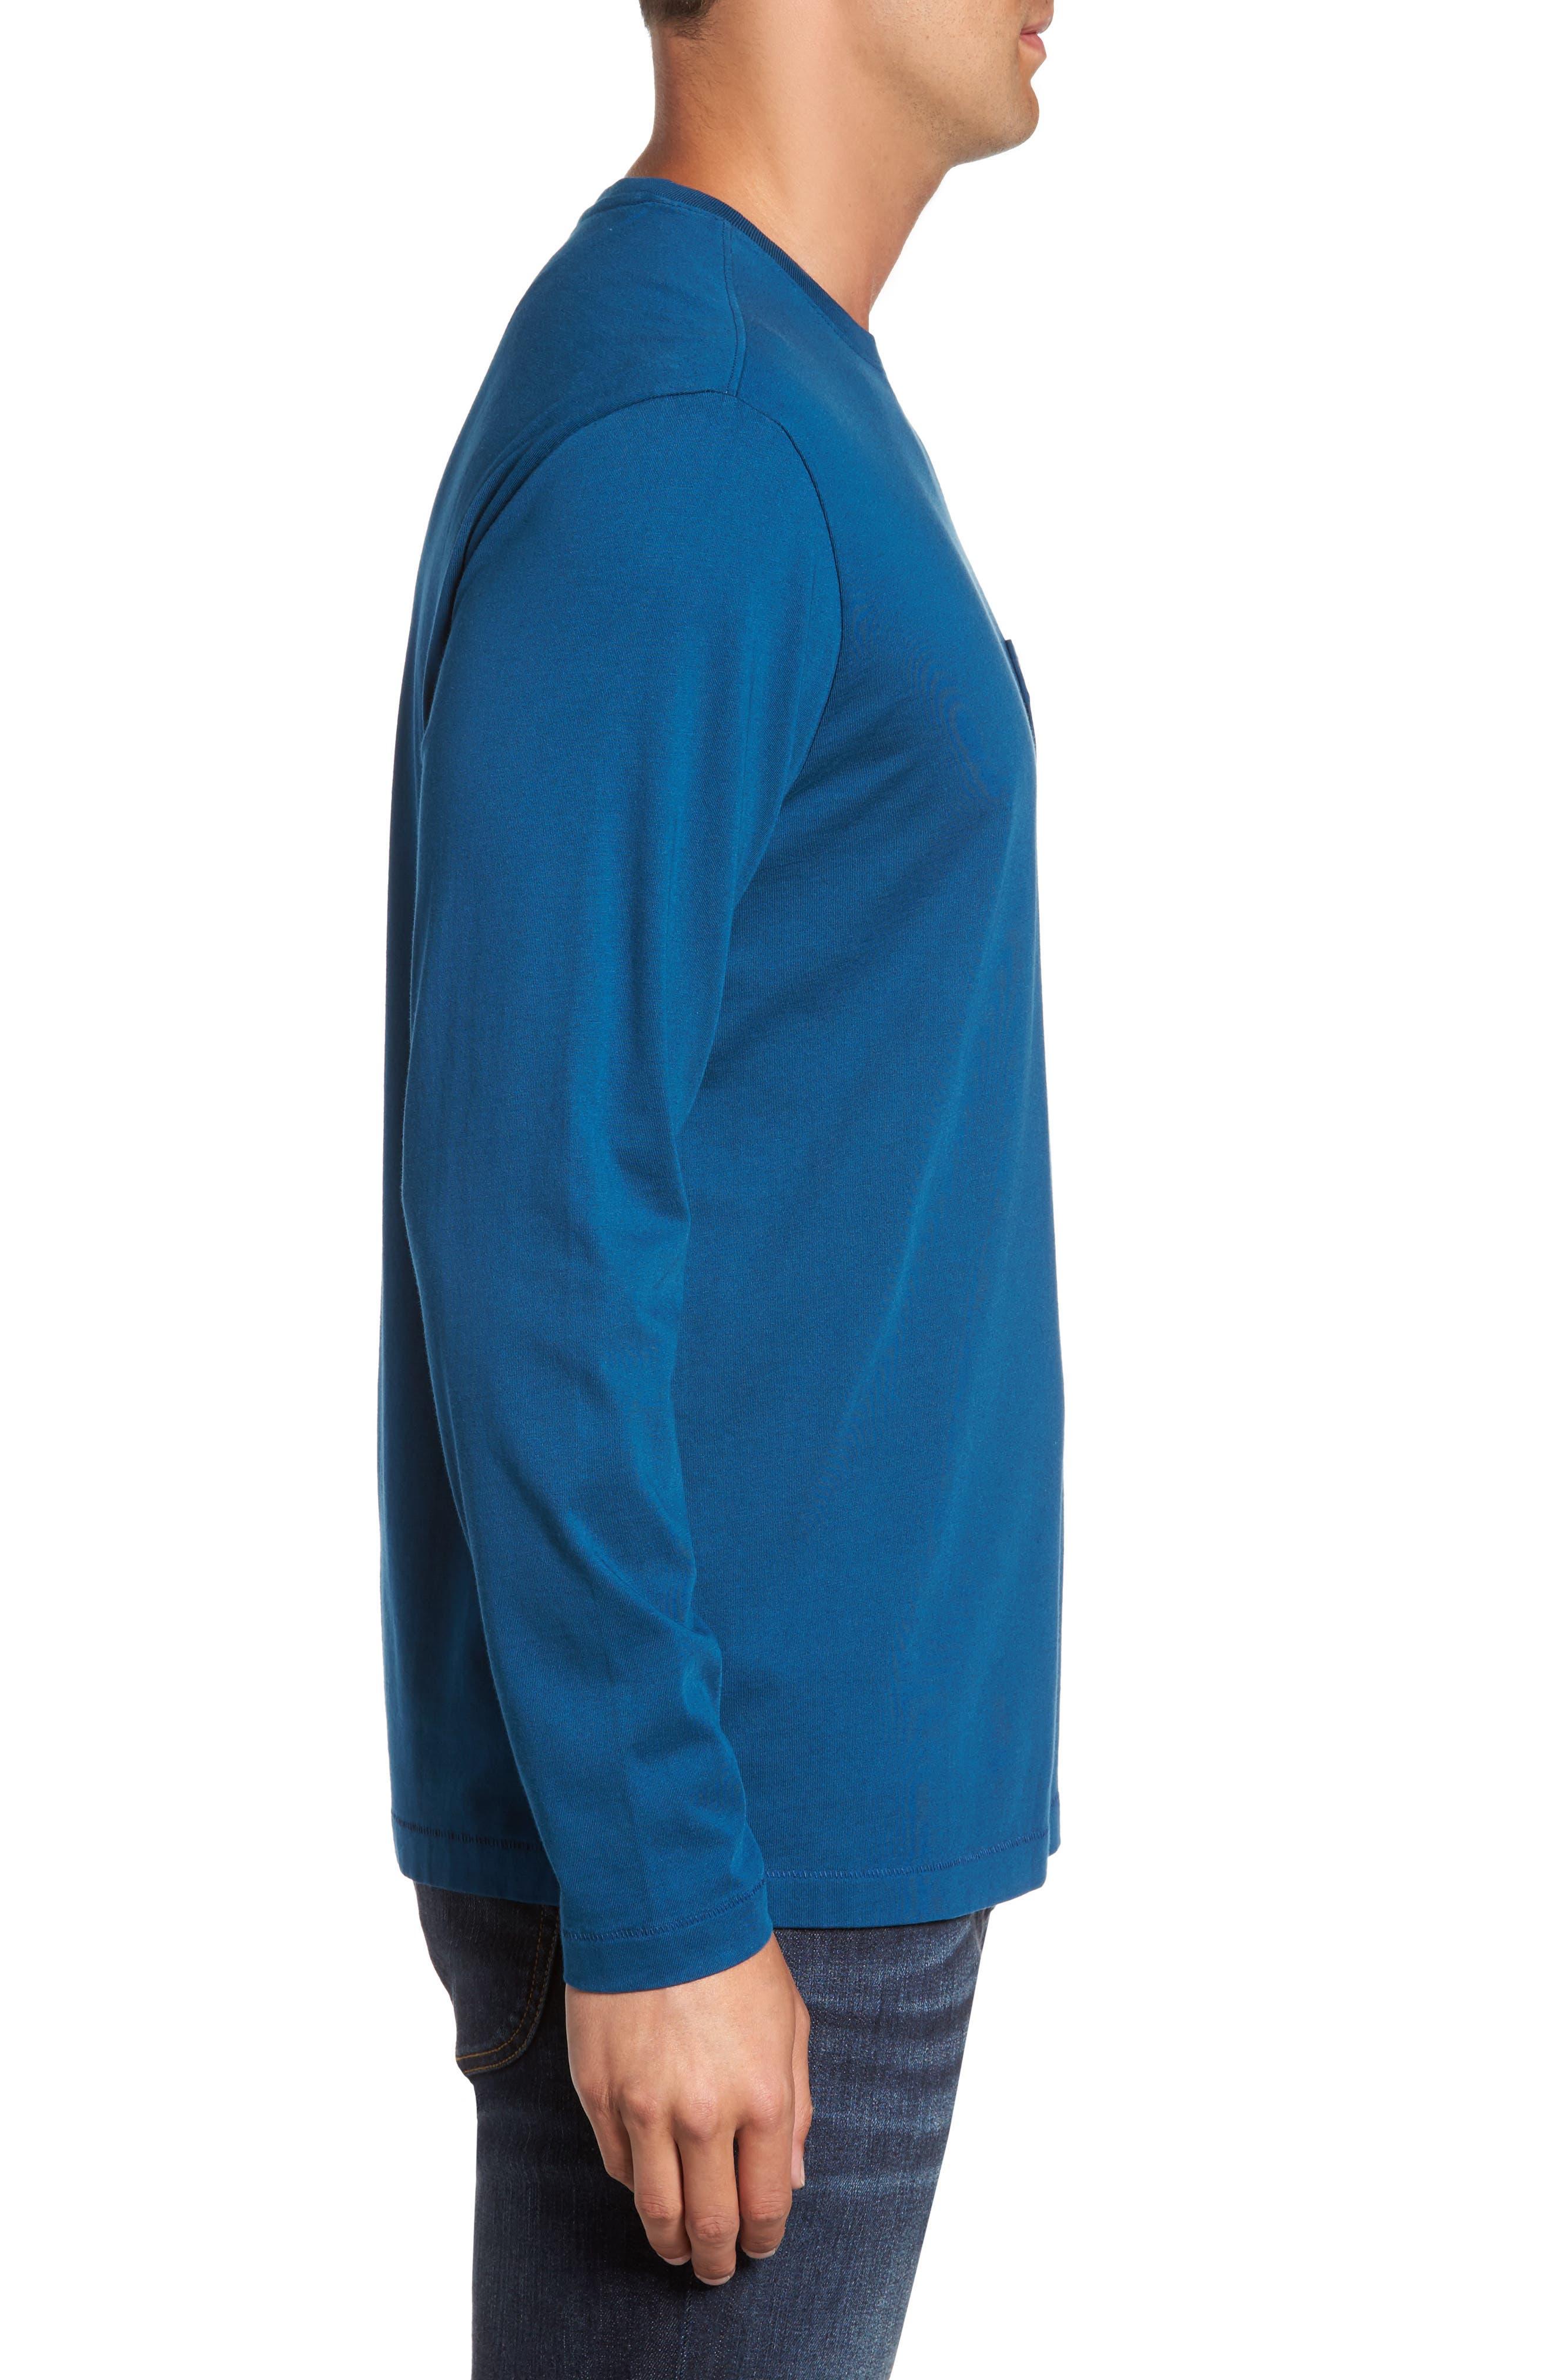 Alternate Image 3  - Tommy Bahama 'Bali Skyline' Long Sleeve Pima Cotton T-Shirt (Big & Tall)